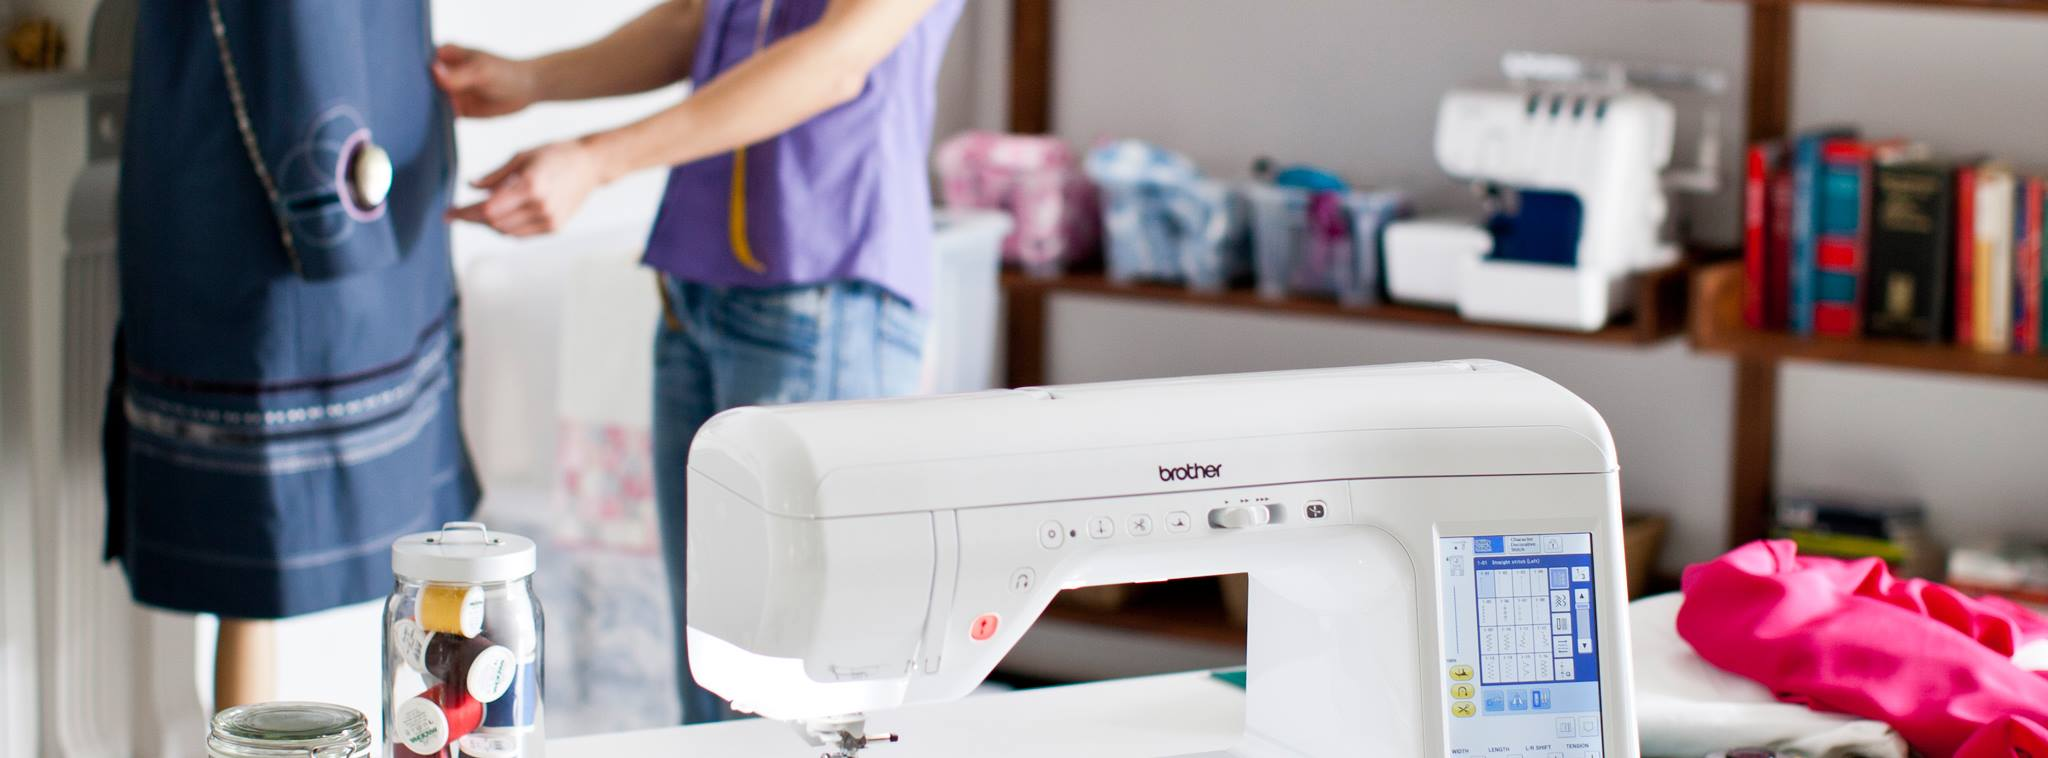 Macchina per cucire in studio